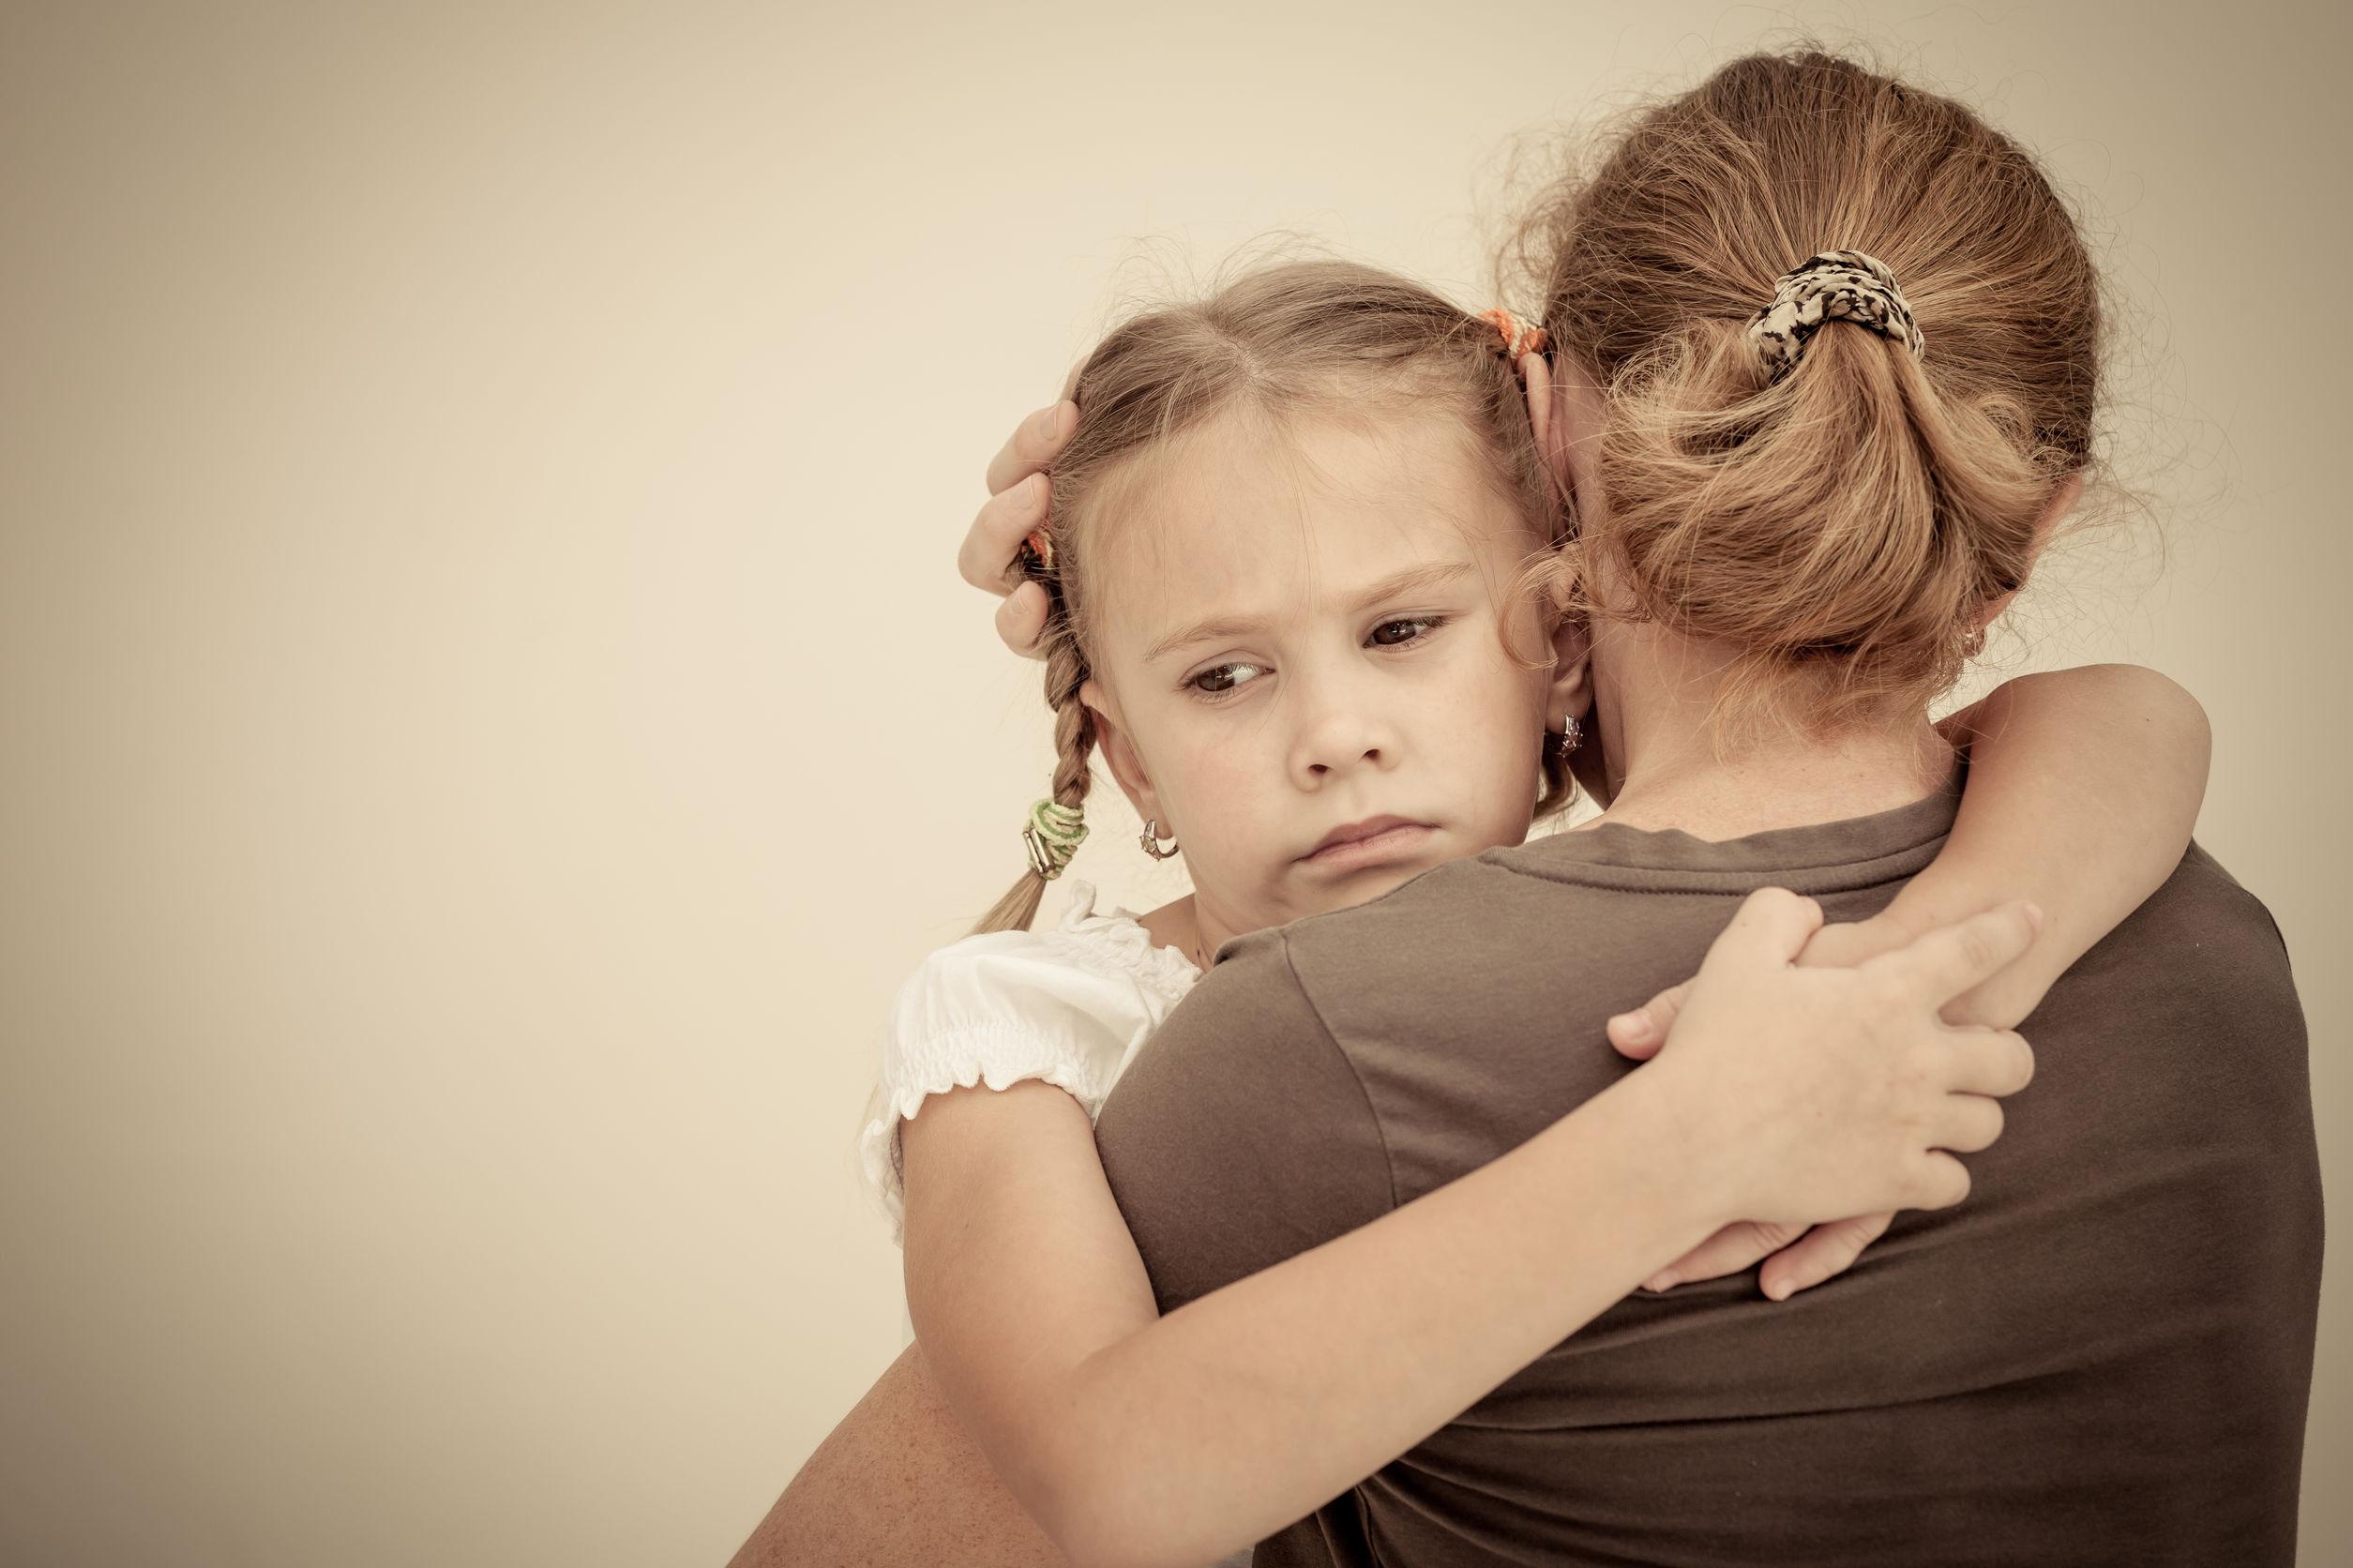 27421952 - sad daughter hugging his mother